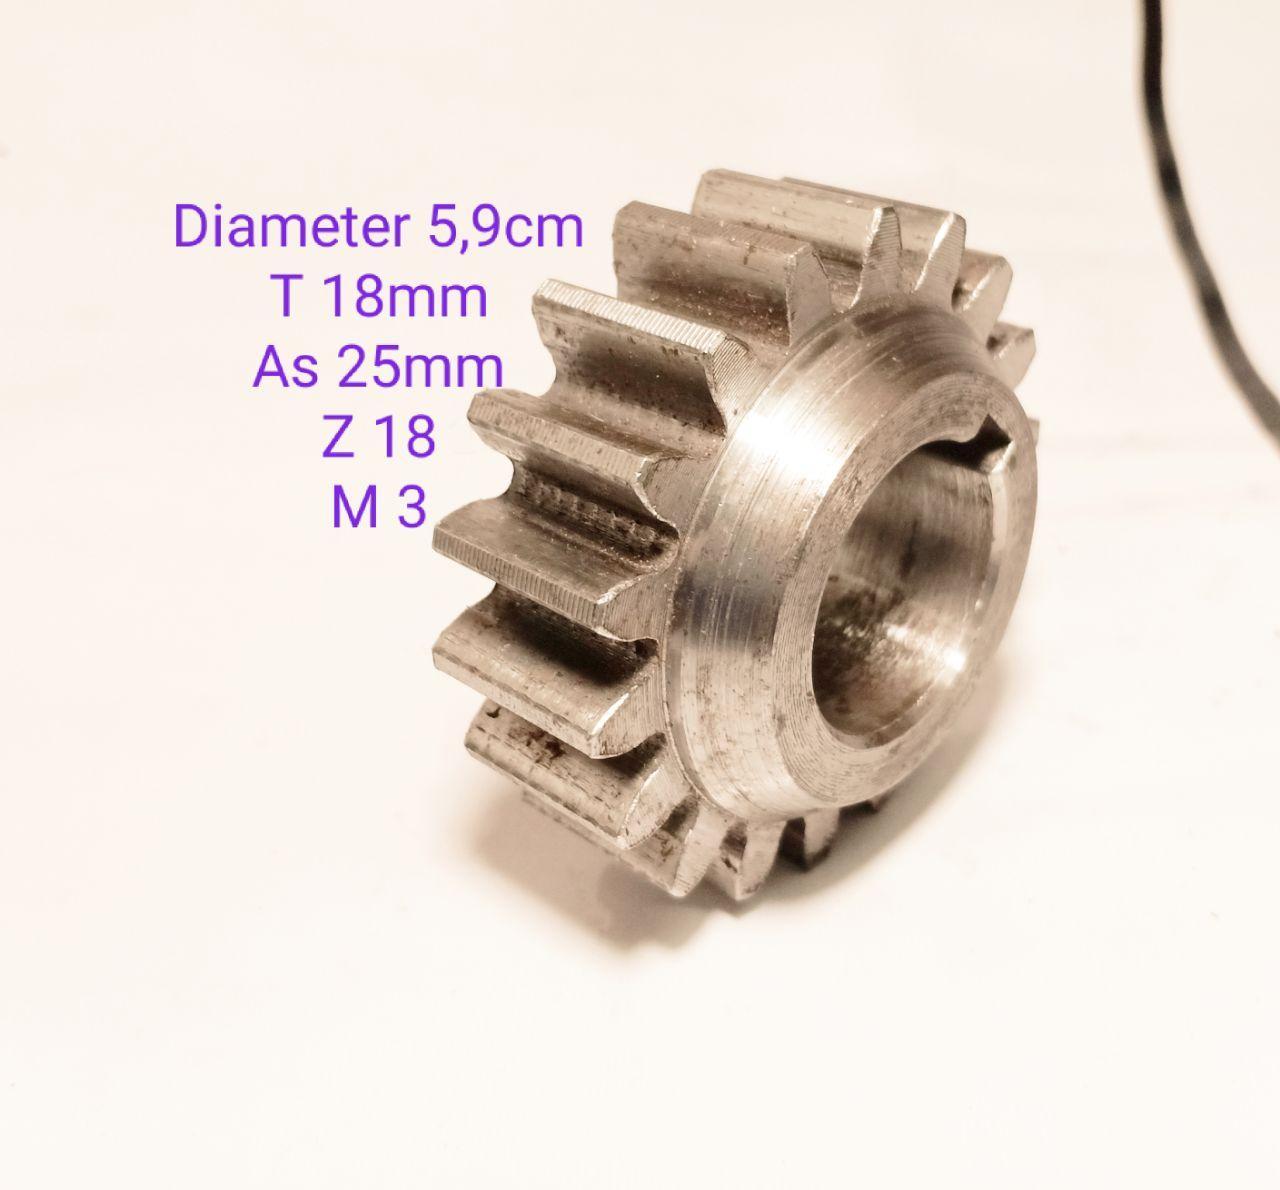 GEAR RODA GIGI DIAMETER 5,9 CM T 18MM AS 25MM Z 18